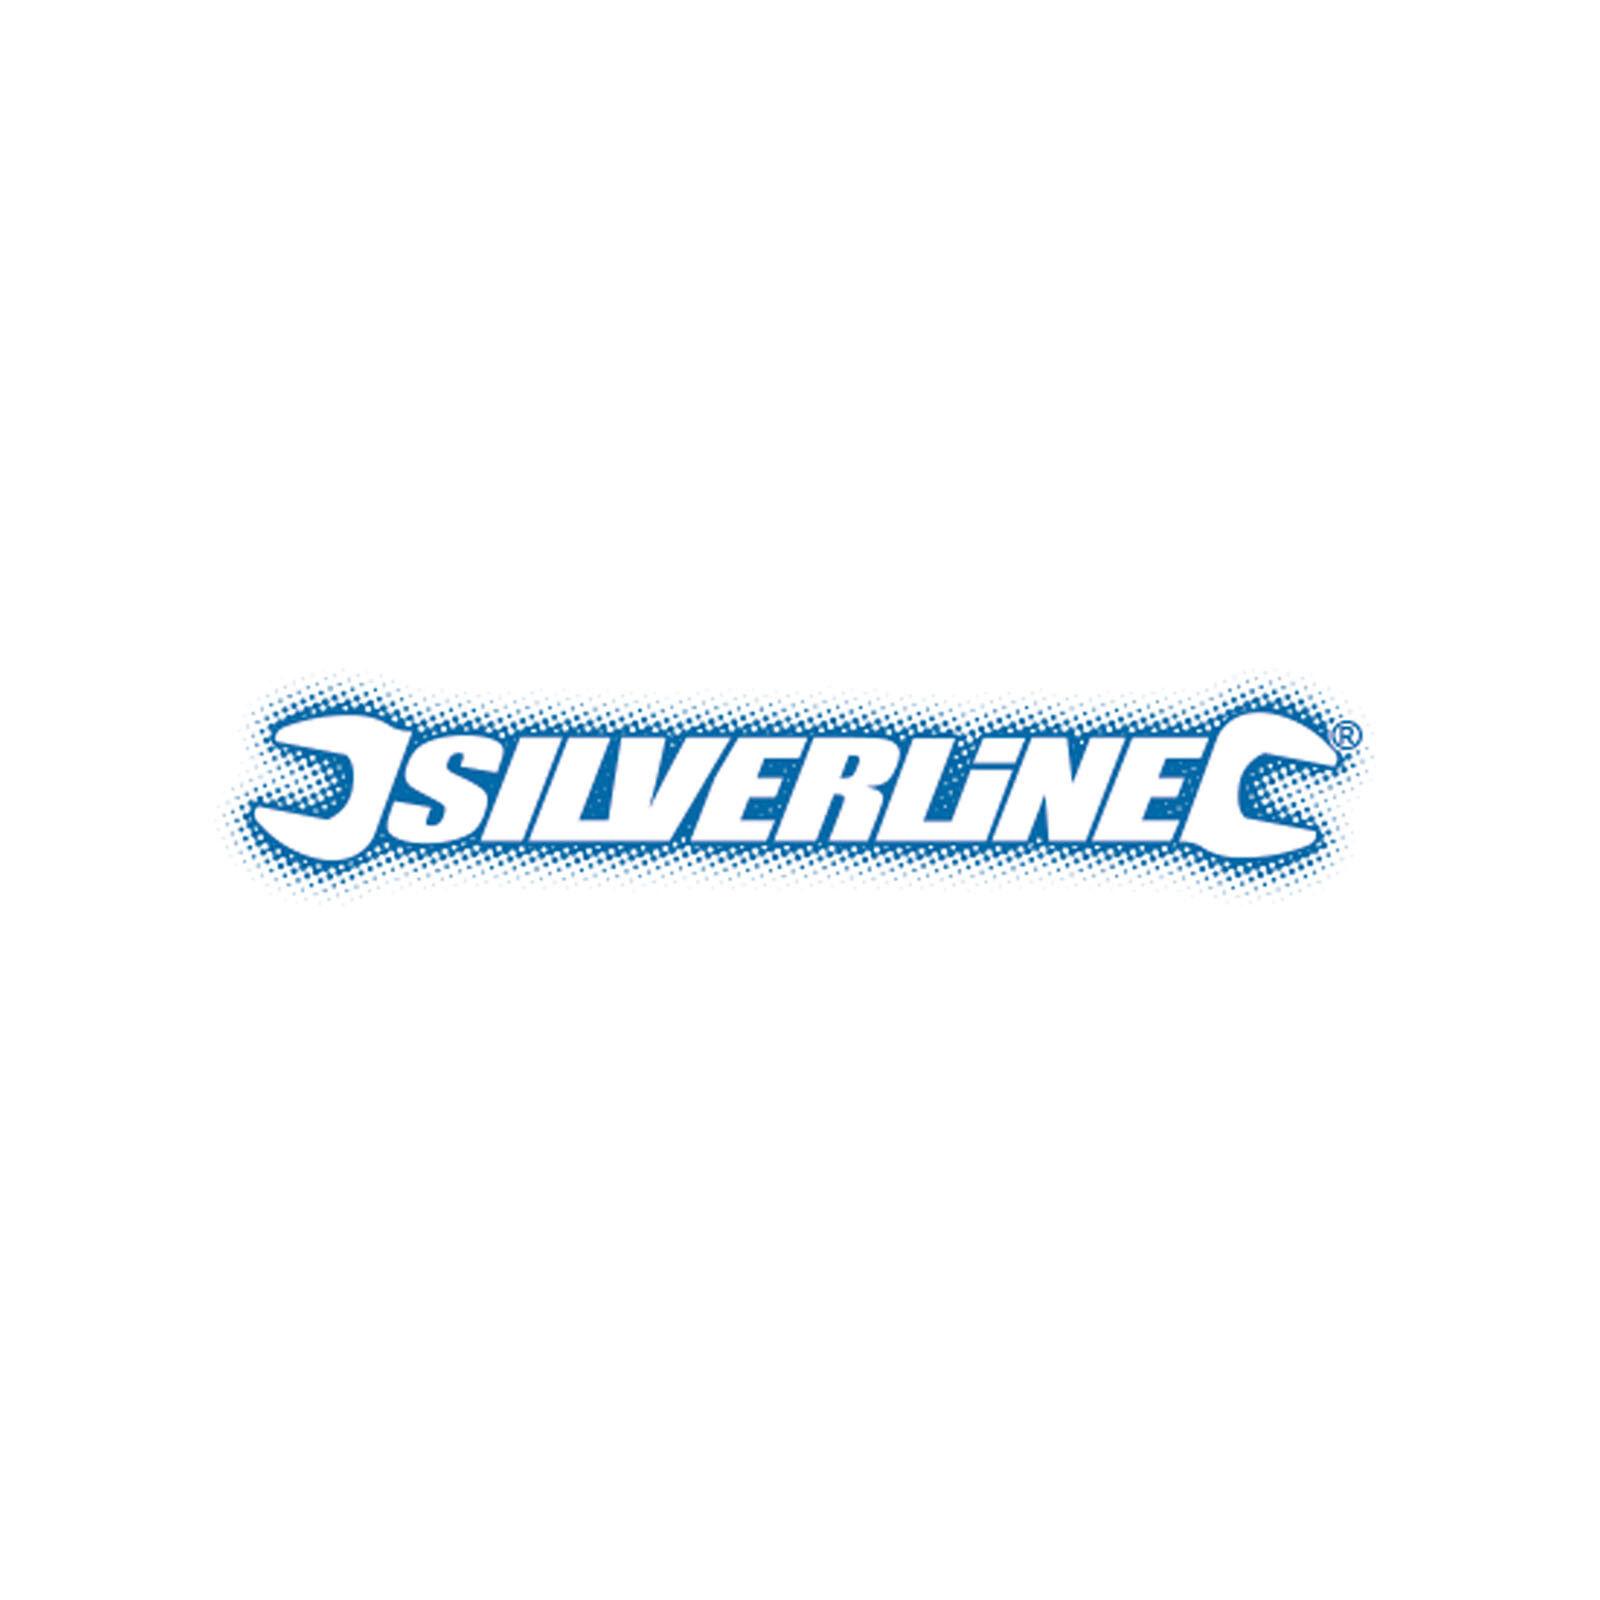 Silverline 868566 Filament End Brush 24 mm Coarse